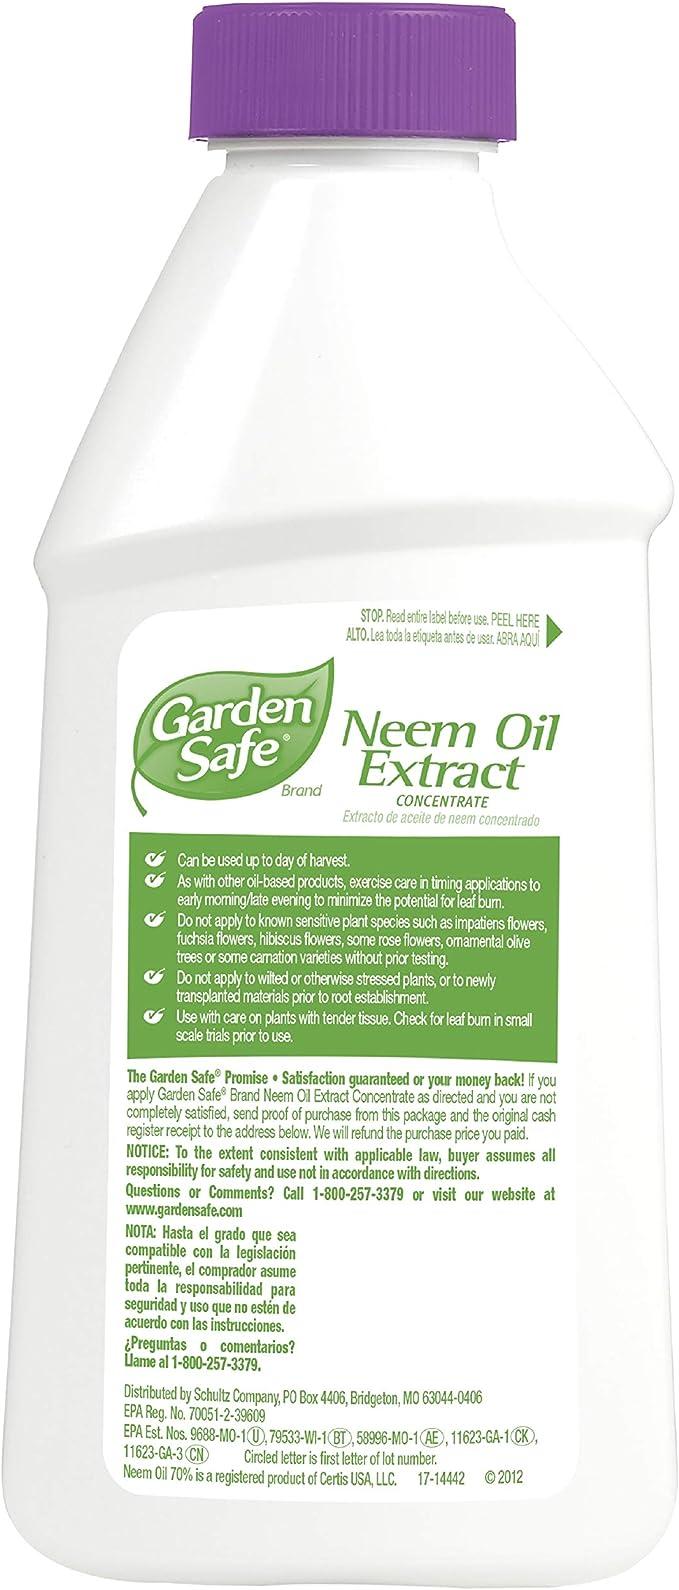 Amazon Com Garden Safe Hg 83179 Neem Oil Extract Concentrate 16 Fl Oz Pack Of 6 Garden Outdoor